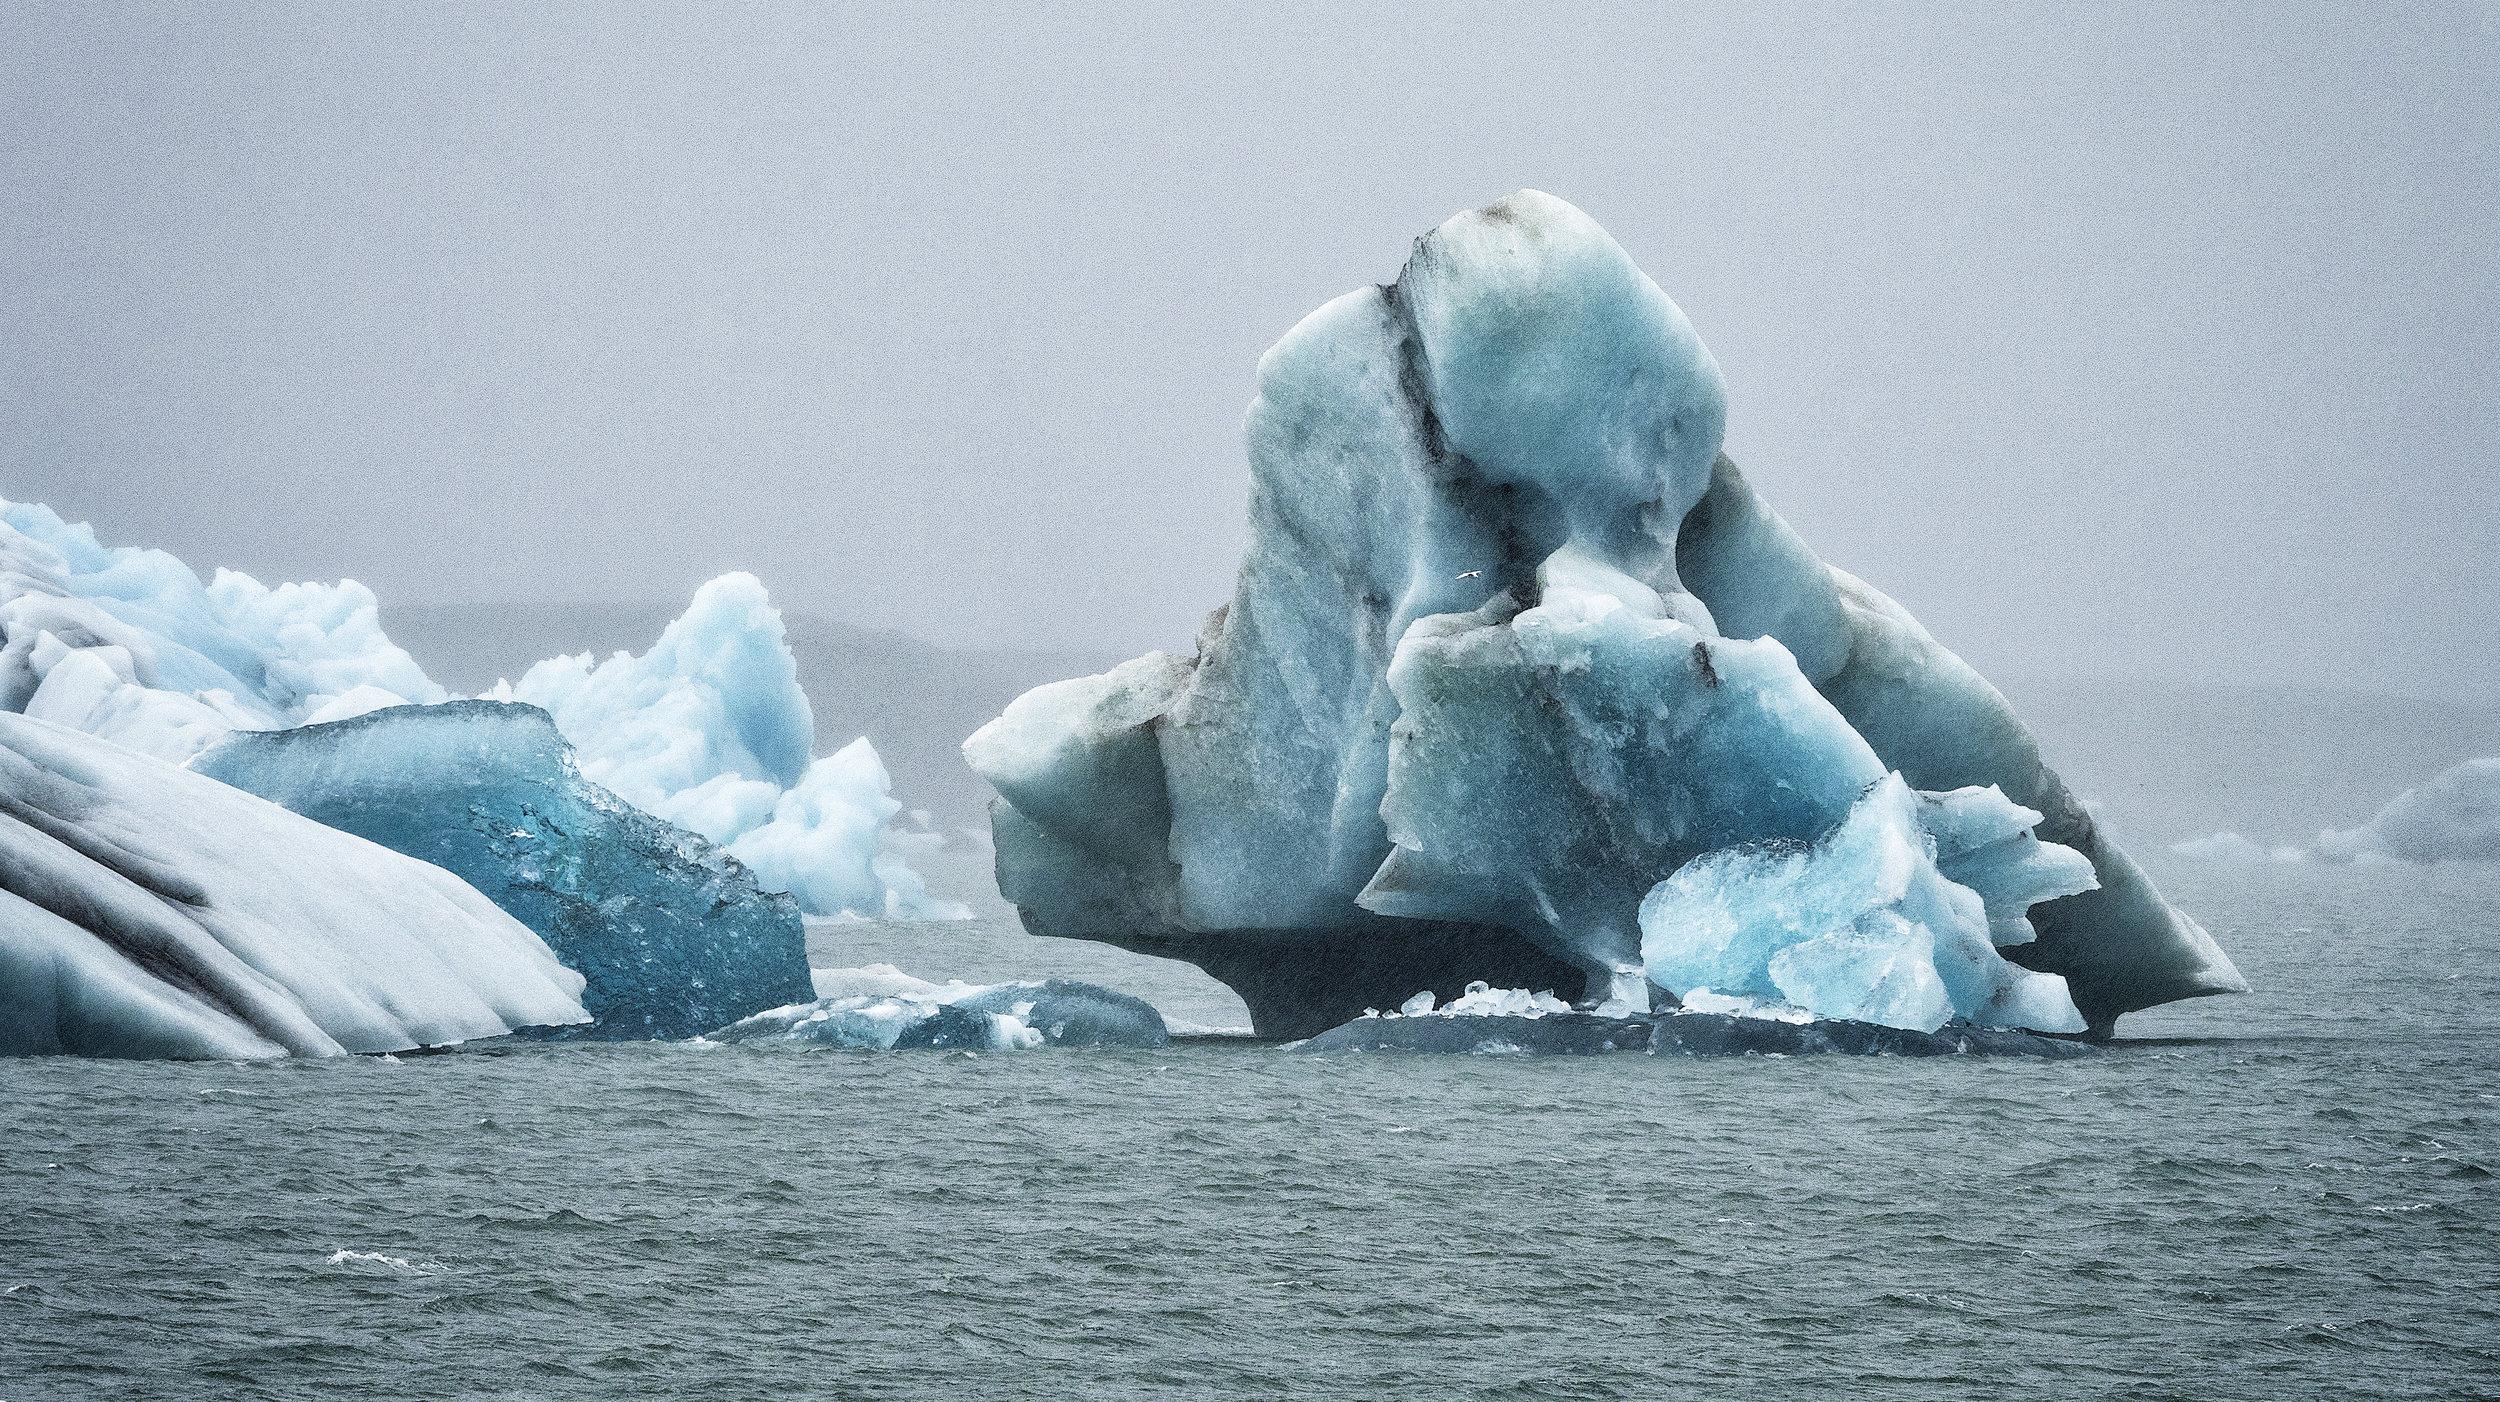 Iceberg, 15 years in the making, in Jokulsarlon